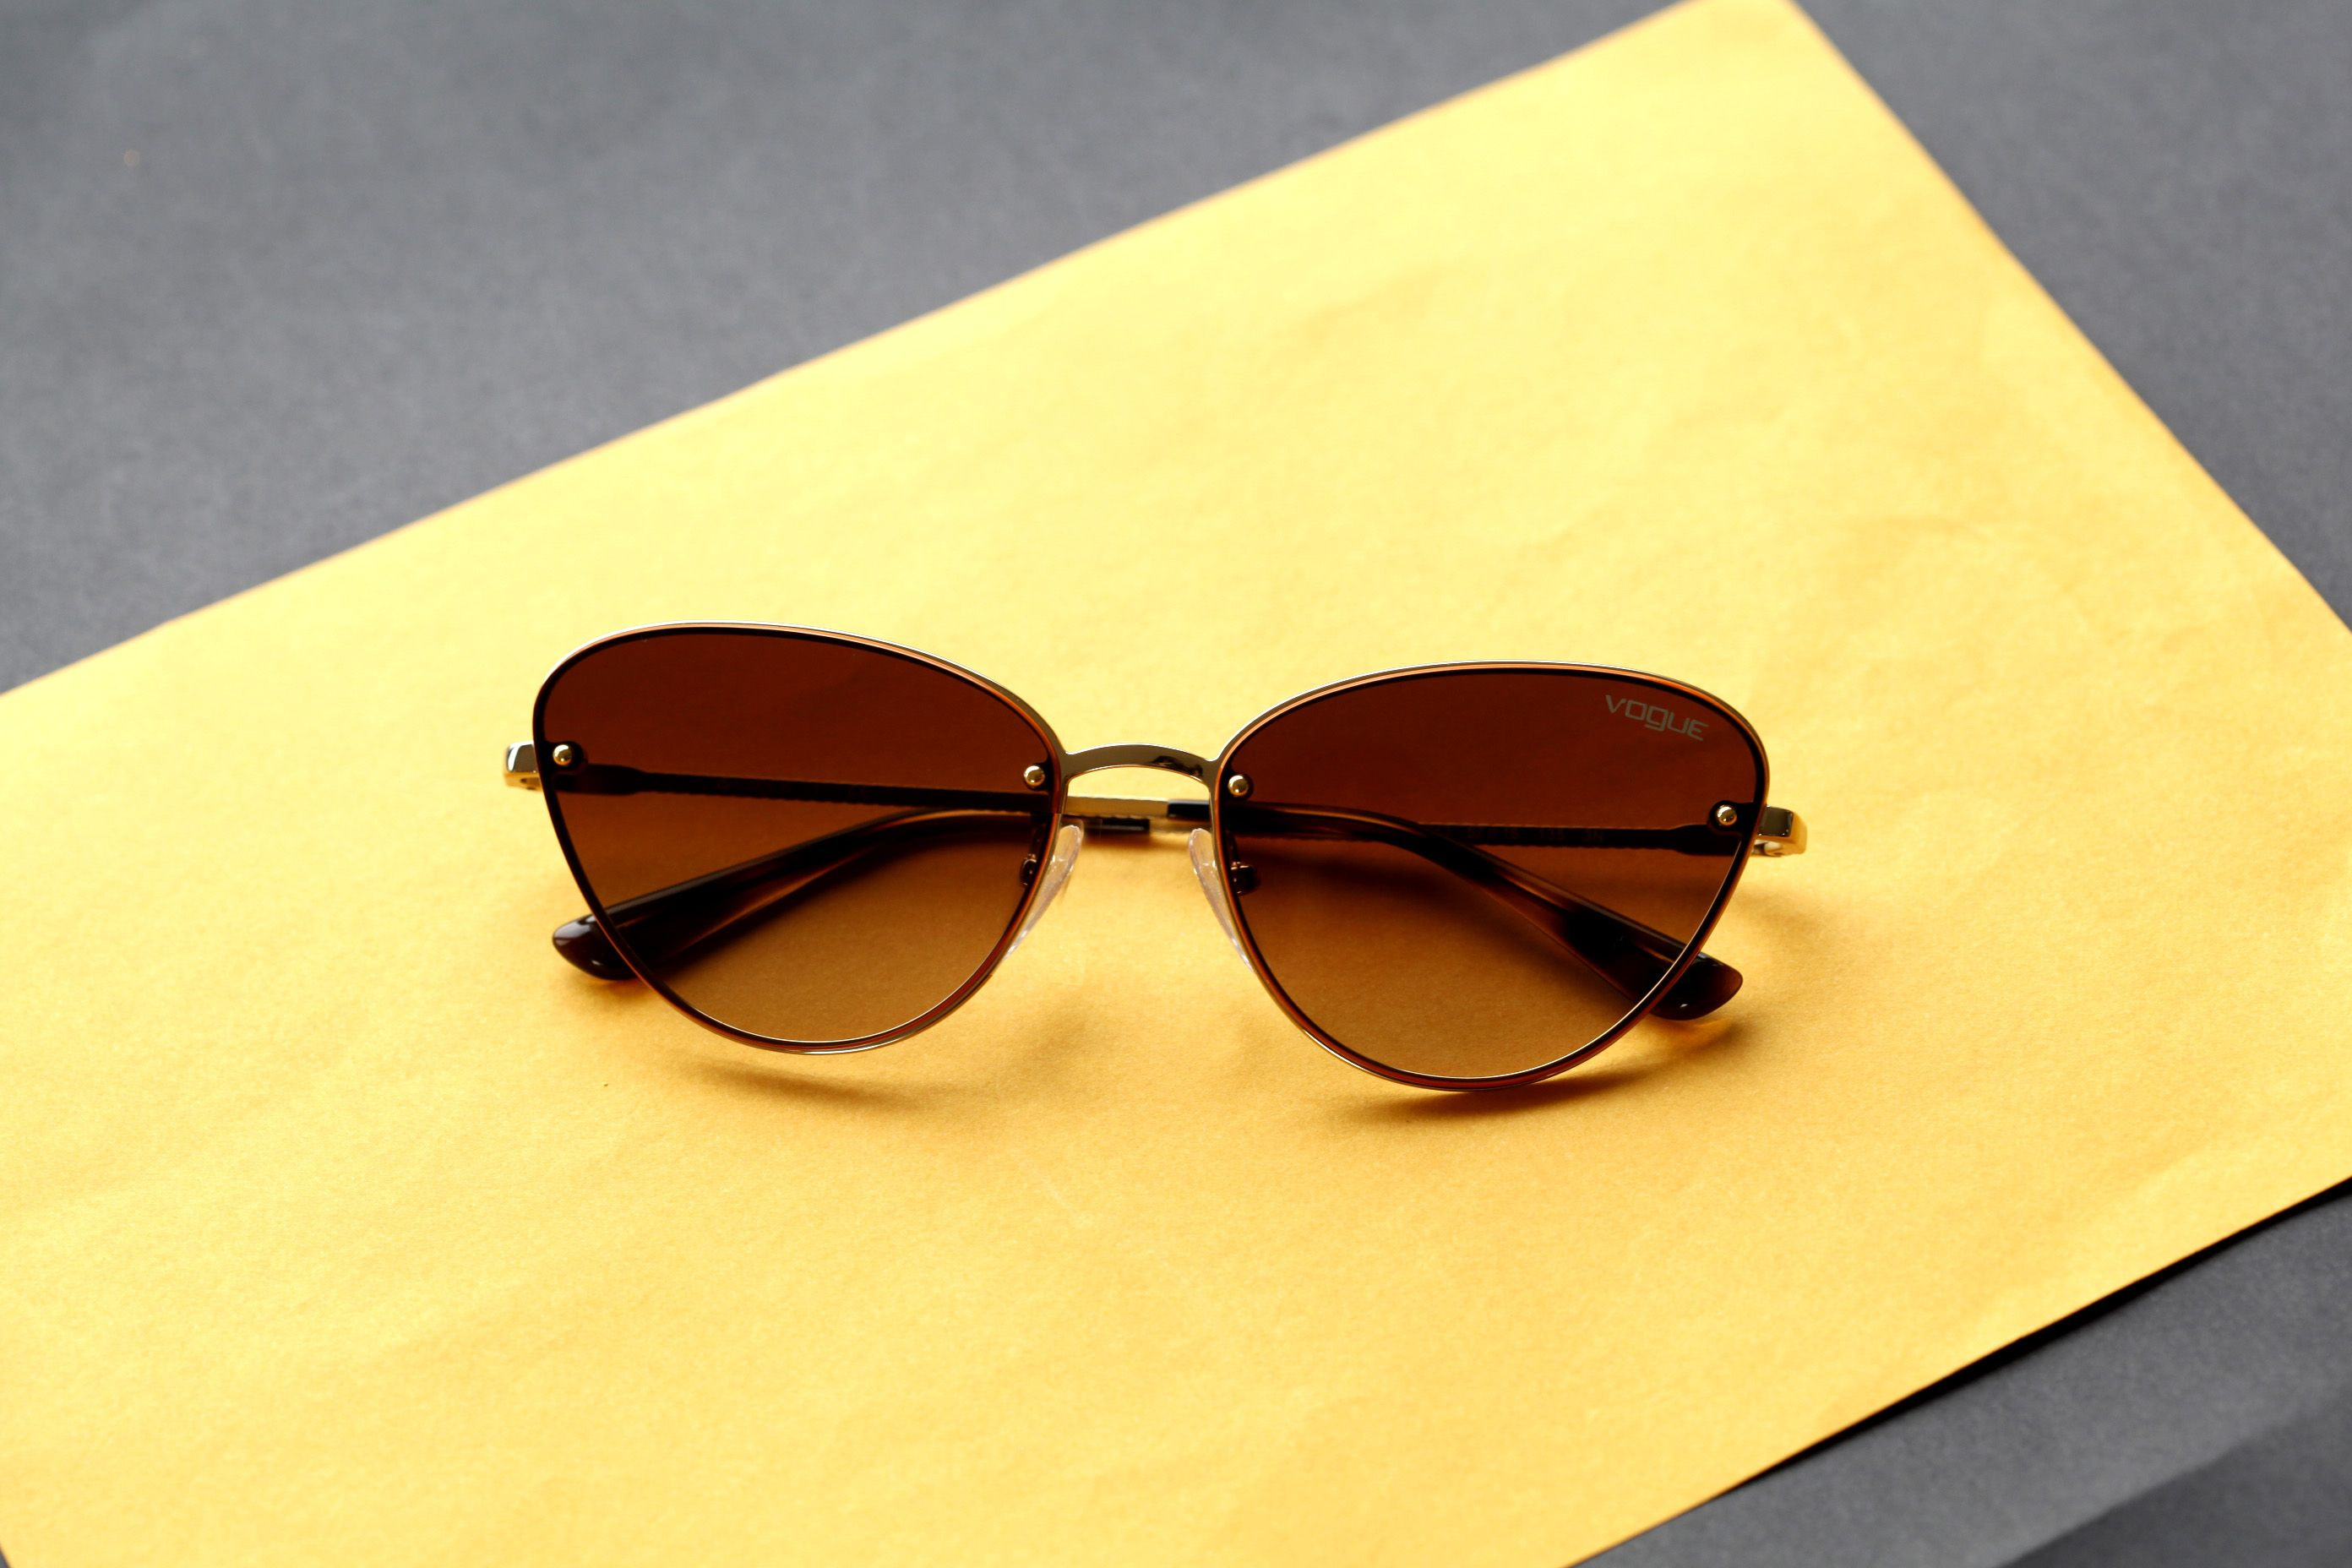 d12c02ec7b57c VOGUE VO 4111 S - ÓCULOS DE SOL  vogue  vogueyewear  oculosdesol   oculosfeminino